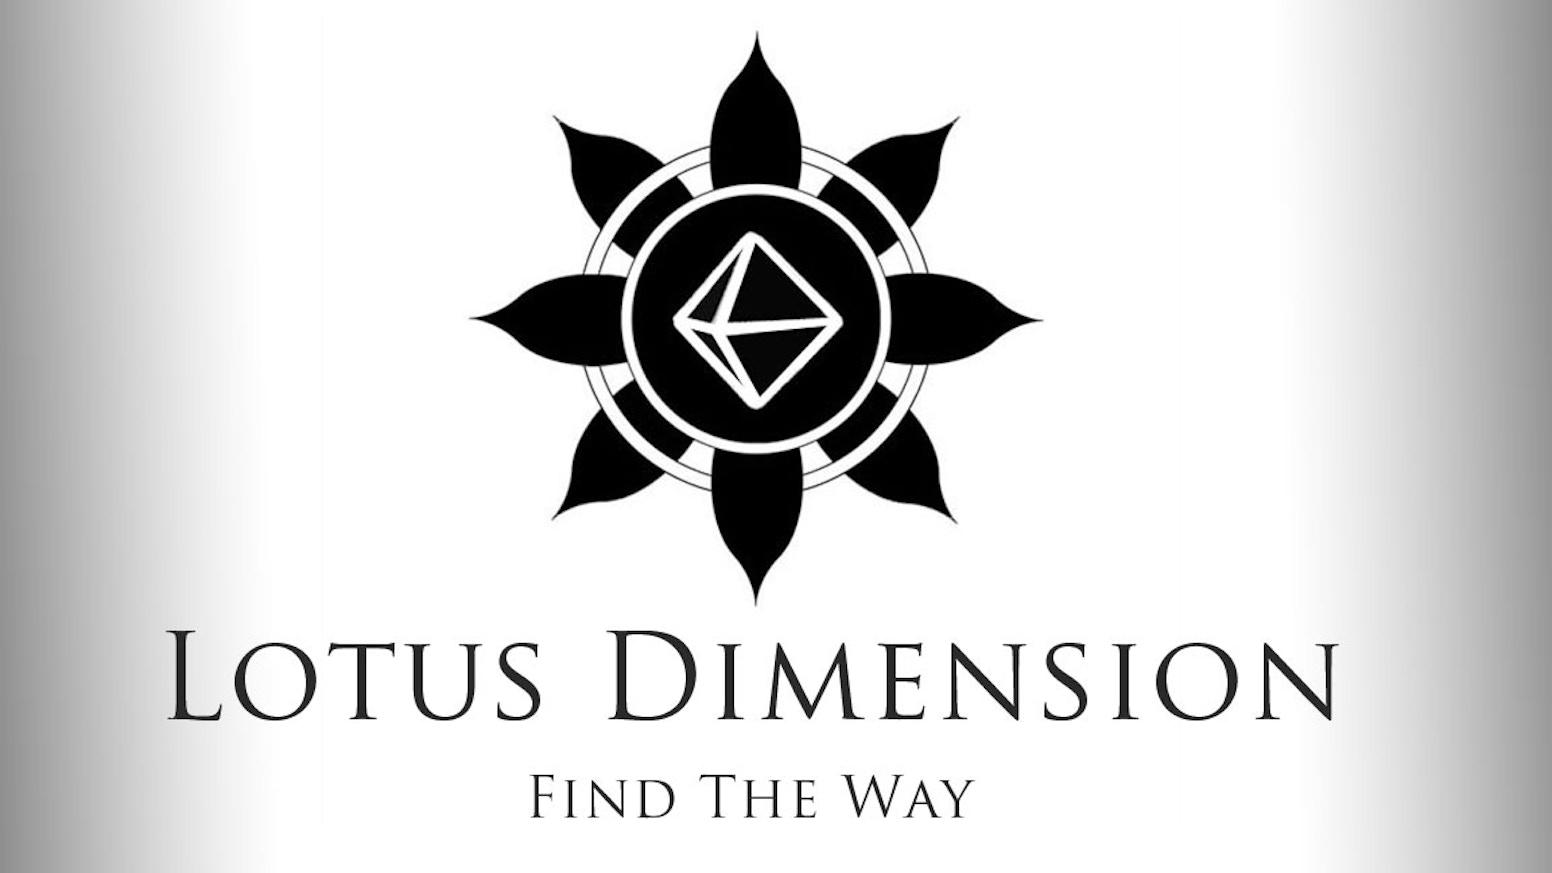 Lotus dimension a new game by scott wayne indiana kickstarter lotus dimension a new game biocorpaavc